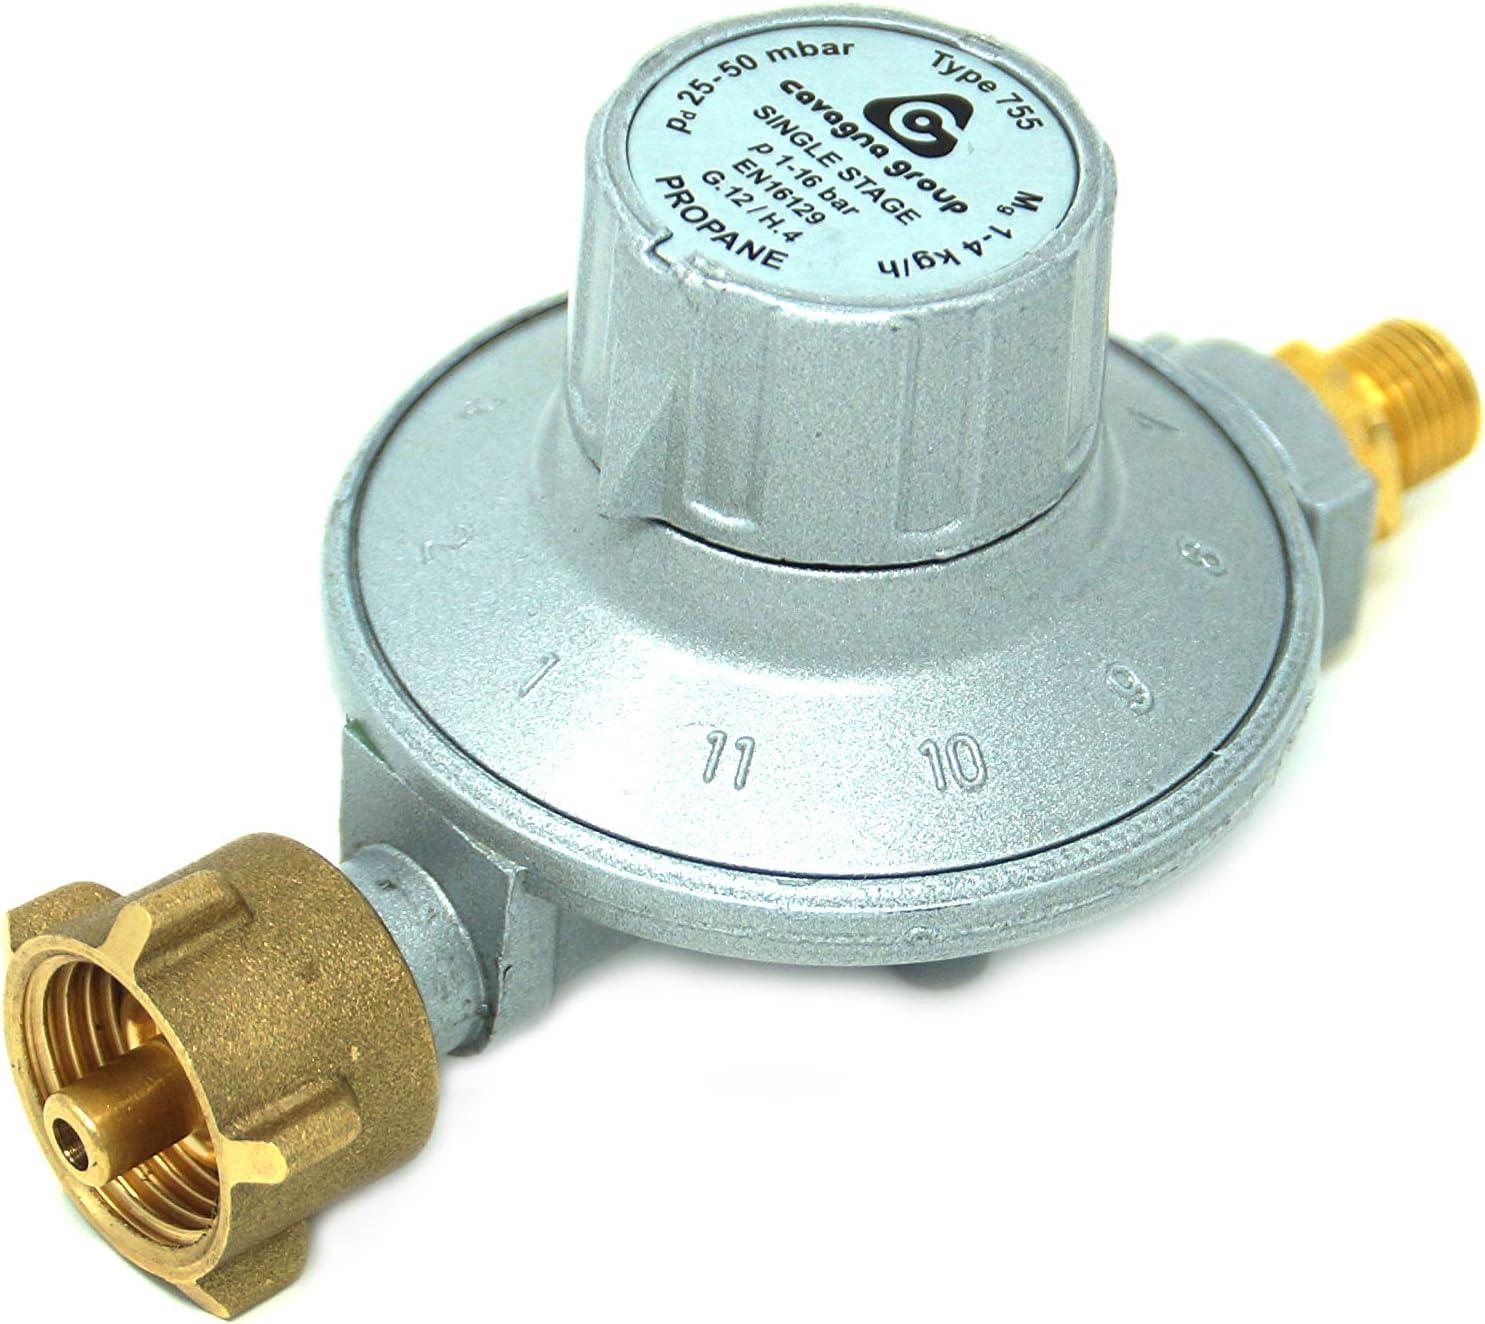 CAVAGNA Regulador de Baja presión 25-50mbar Regulador de presión de Gas Ajustable de 11 etapas para Parrilla de Gas, Calentador Radiante, Calentador Radiante para terraza, Olla